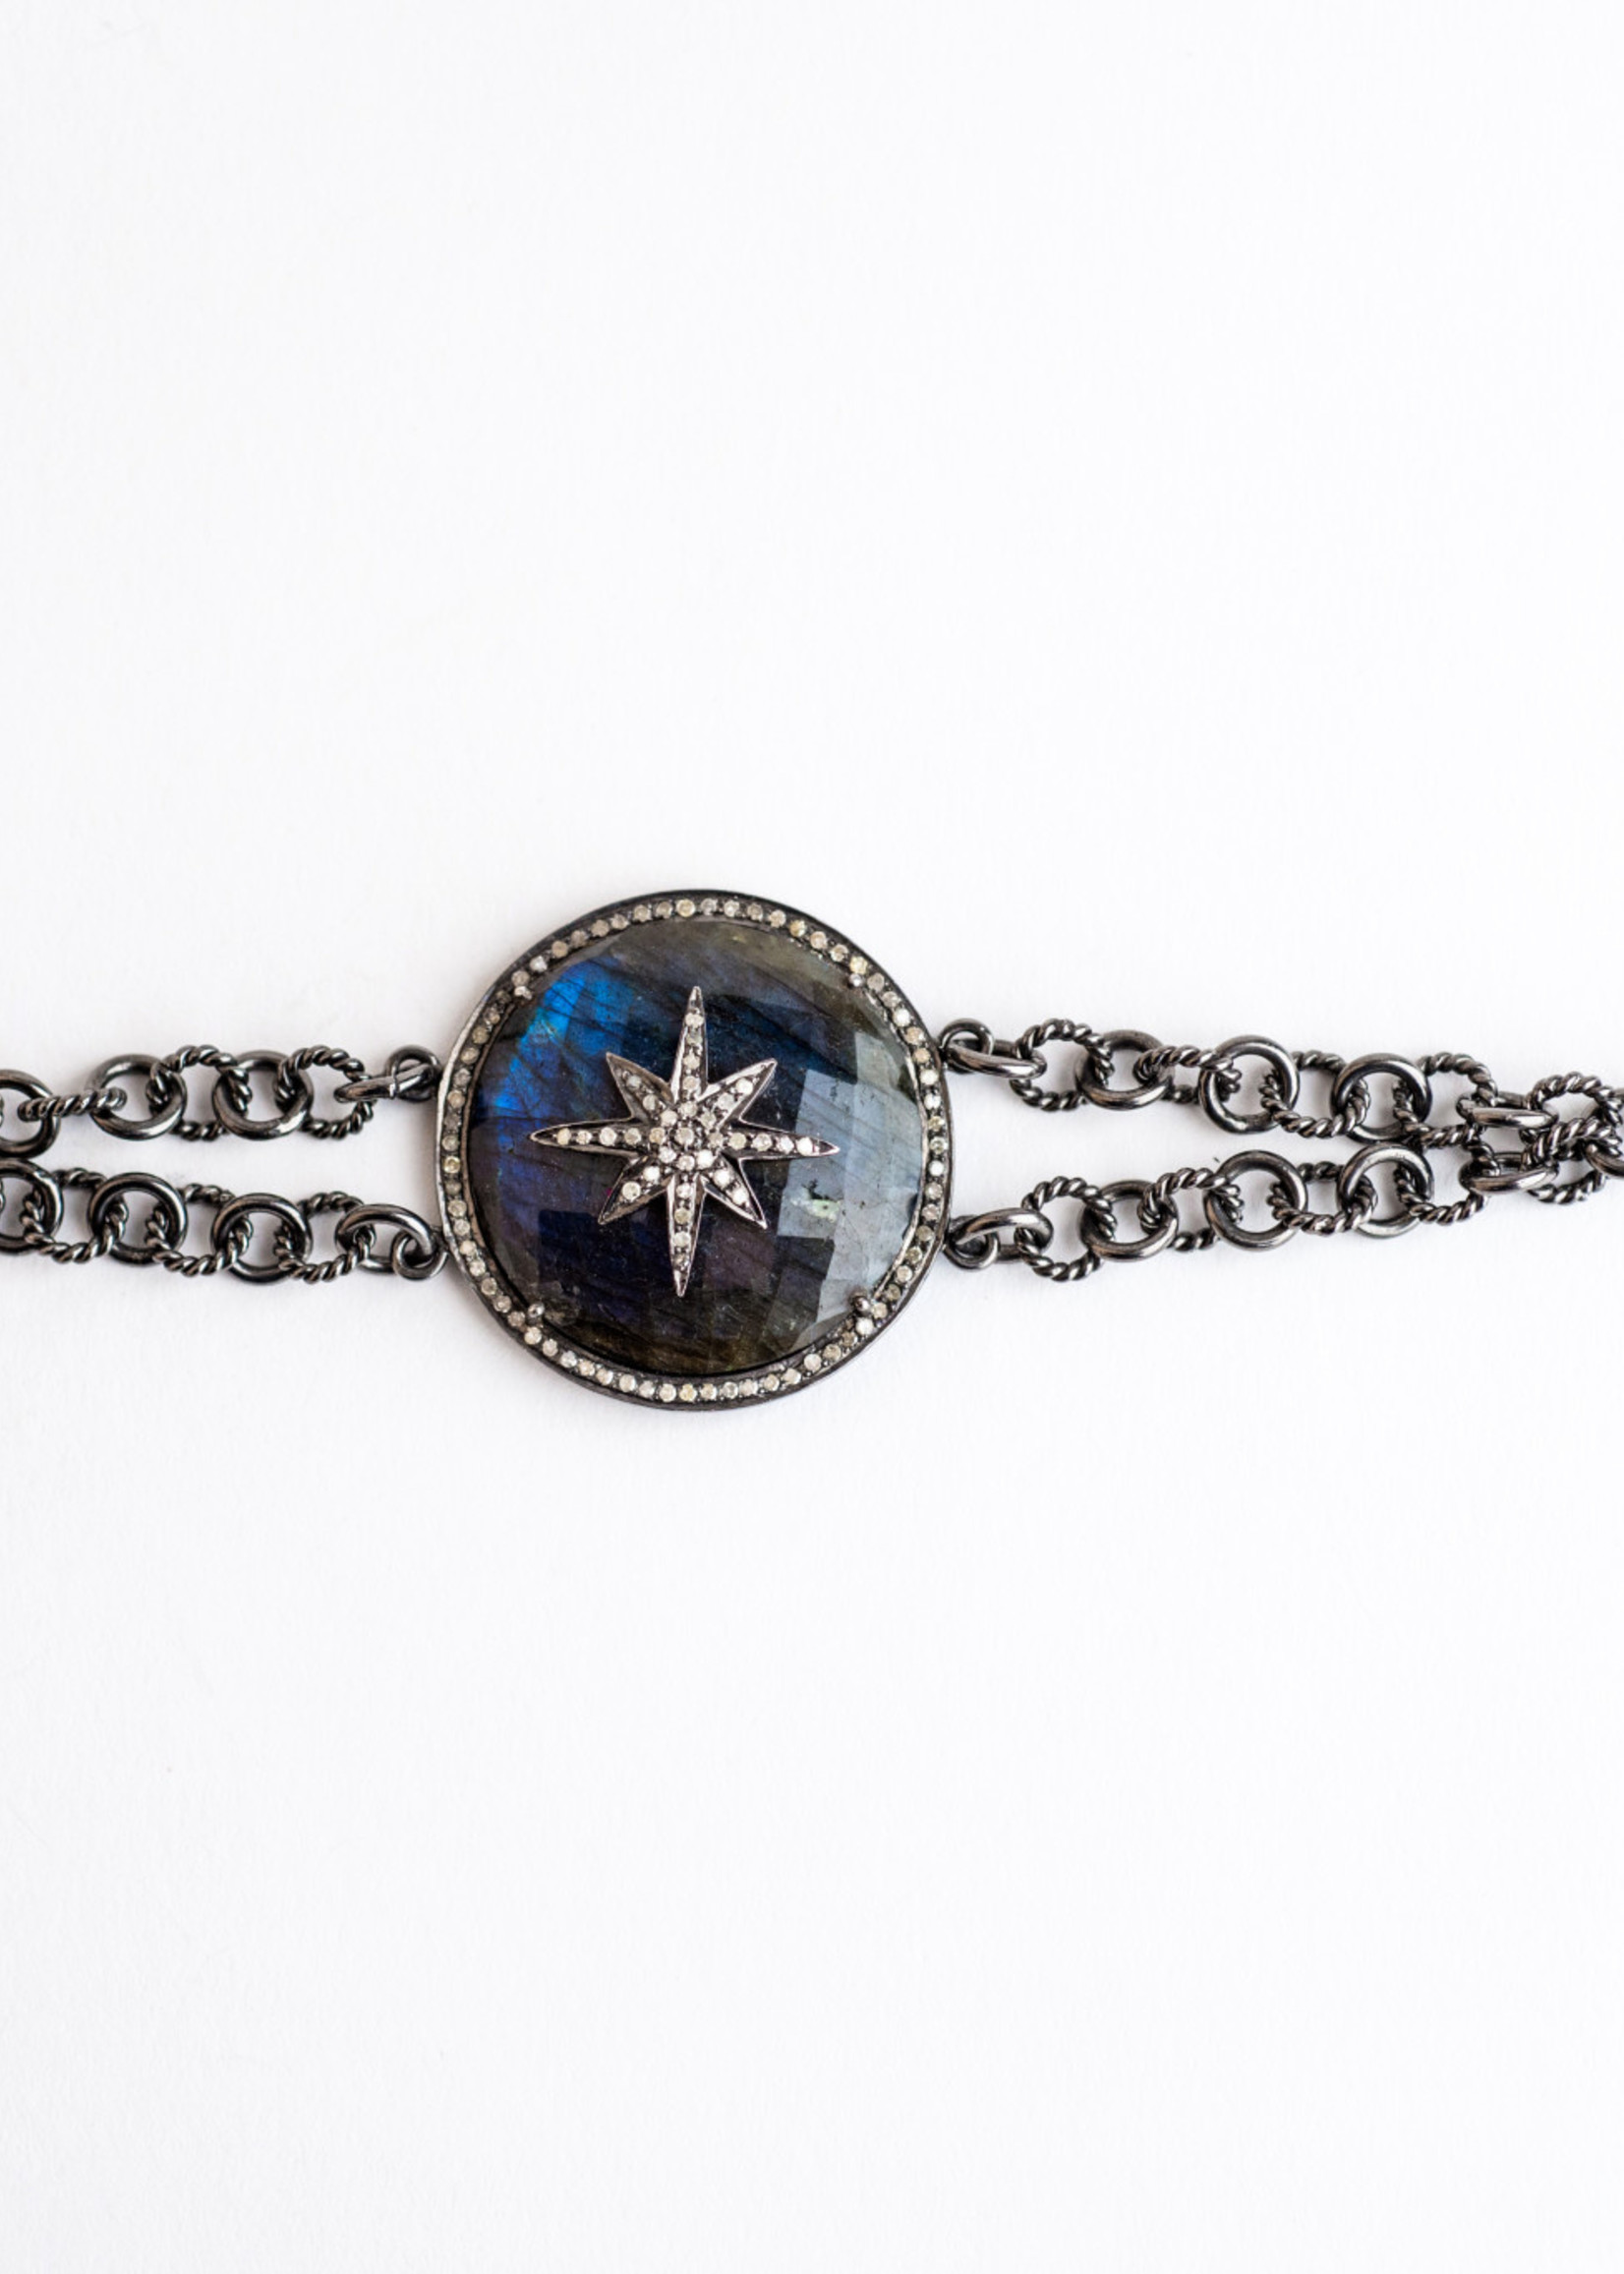 Mina Danielle Labradorite and Diamond Star Pendant on Double Strand Oxidized Chain